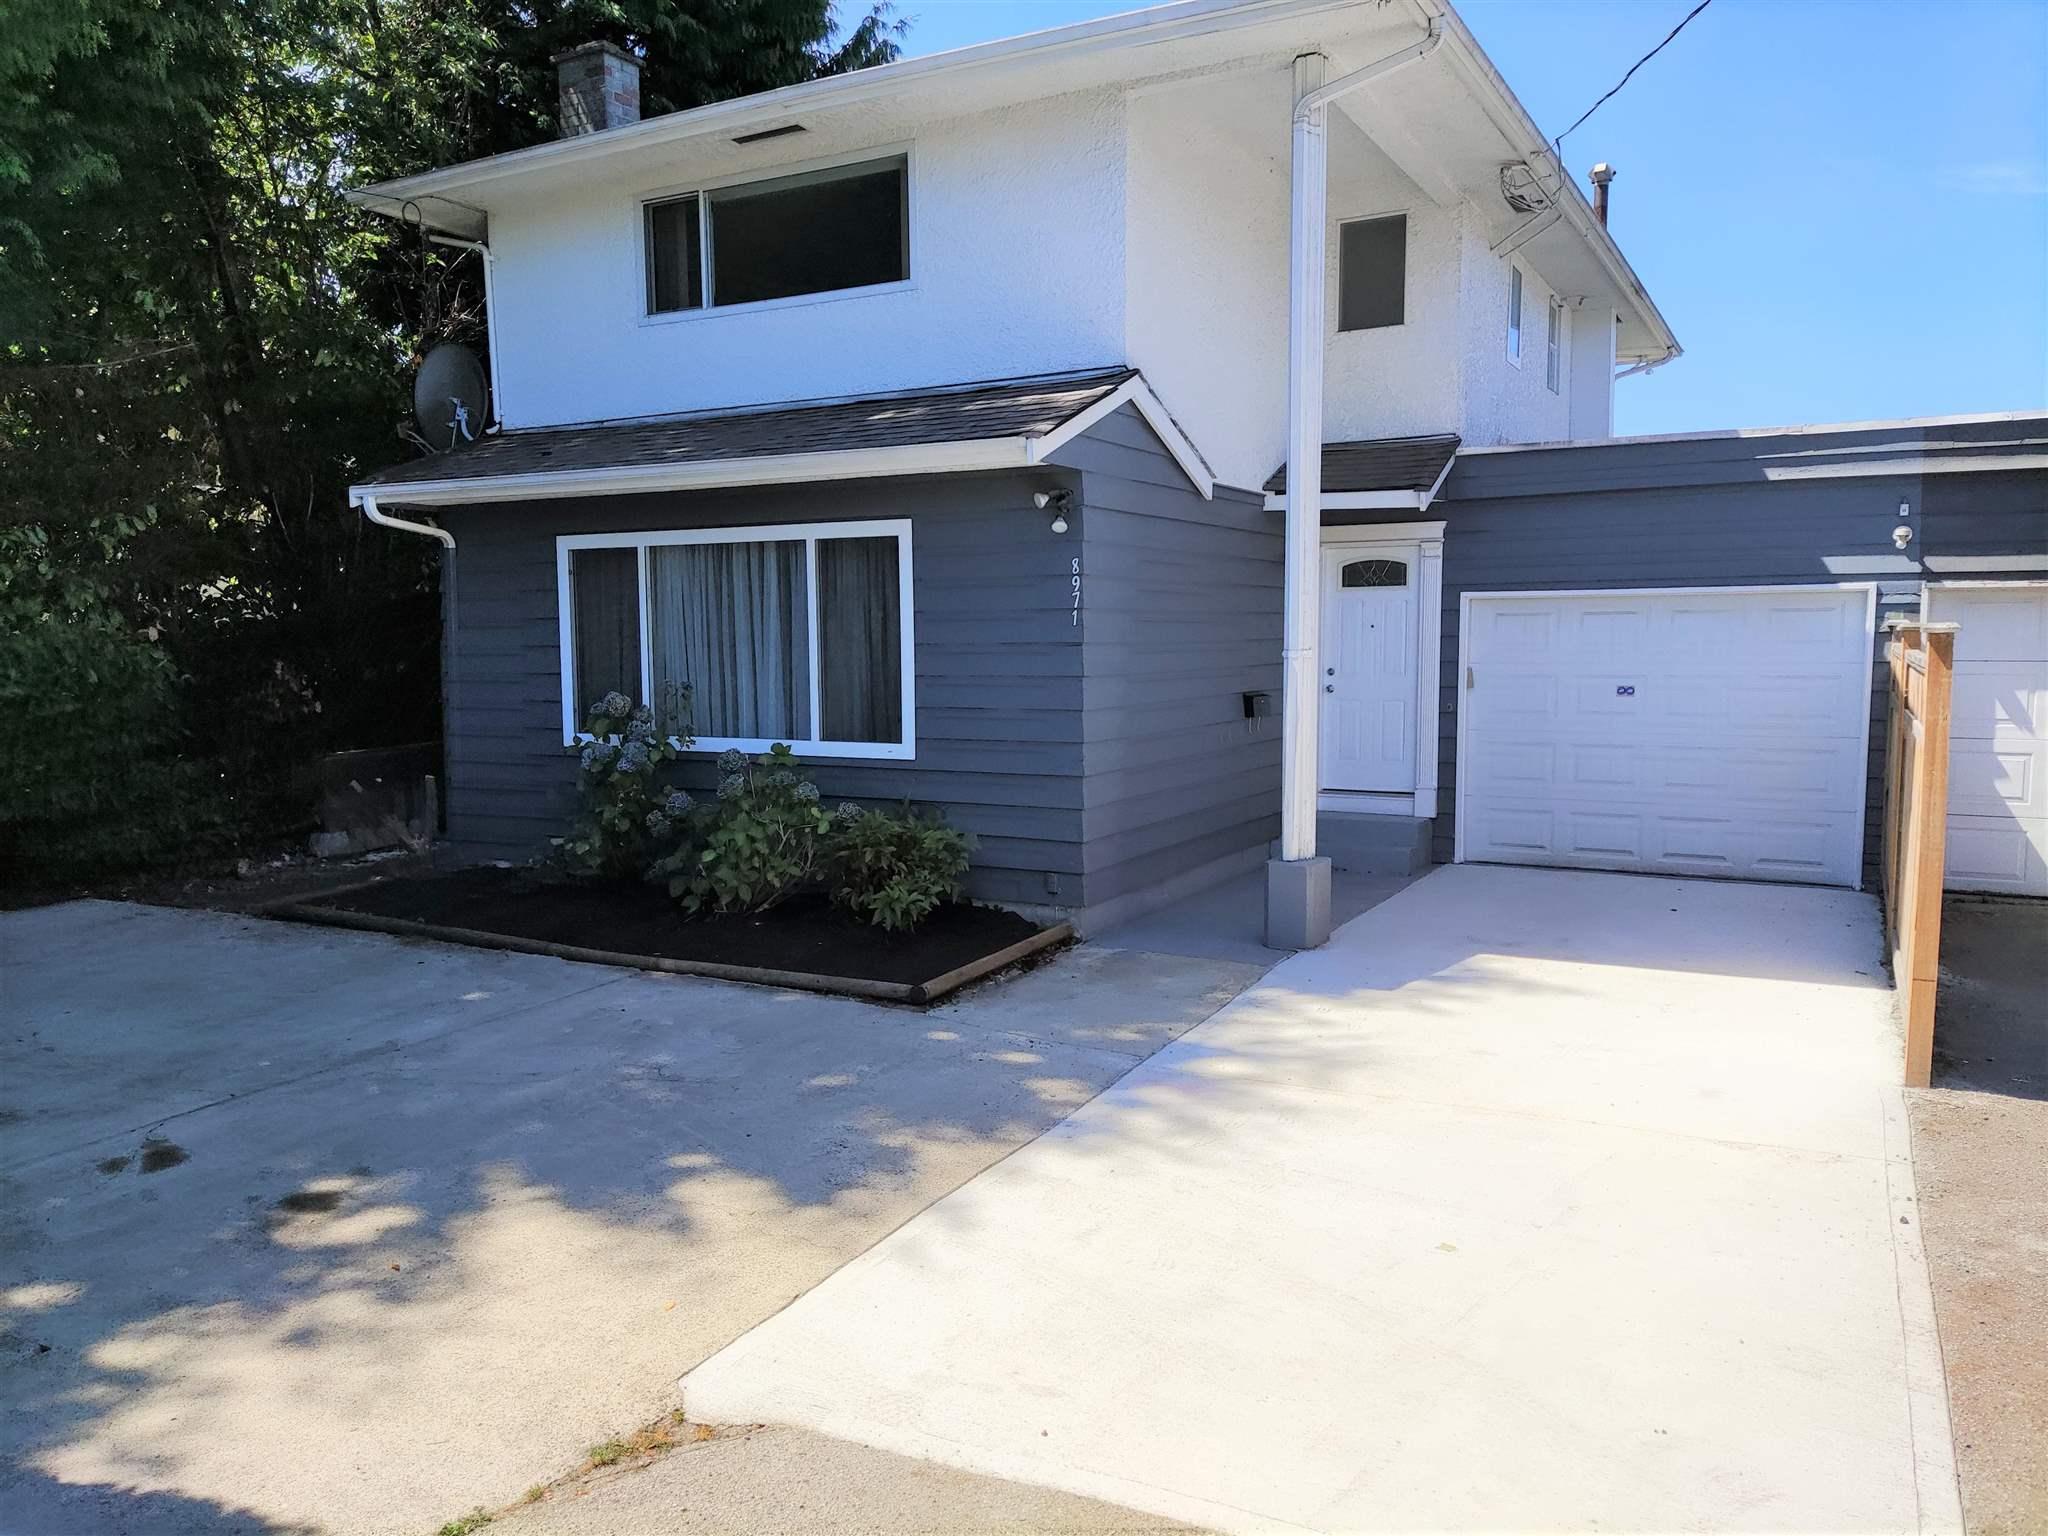 8971 ST. ALBANS ROAD - Garden City 1/2 Duplex for sale, 4 Bedrooms (R2608040)